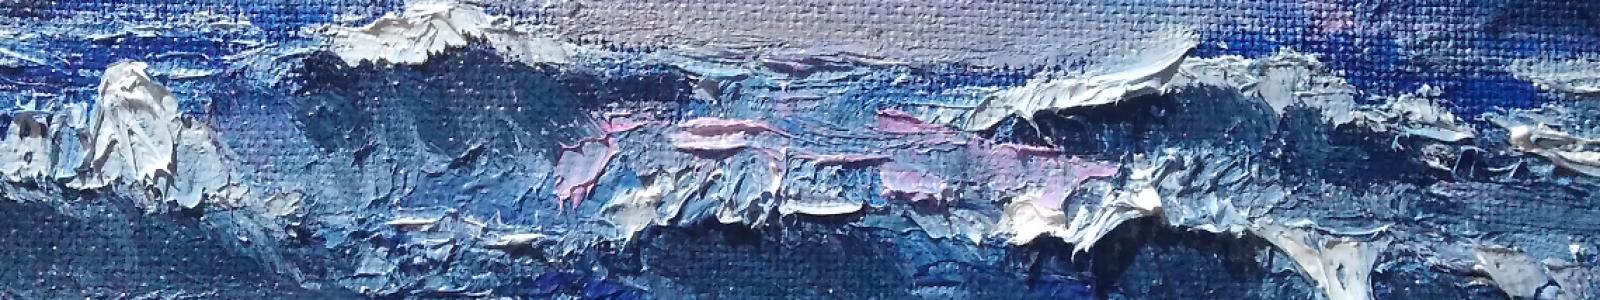 Gallery Painter Ekaterina Steponenkova